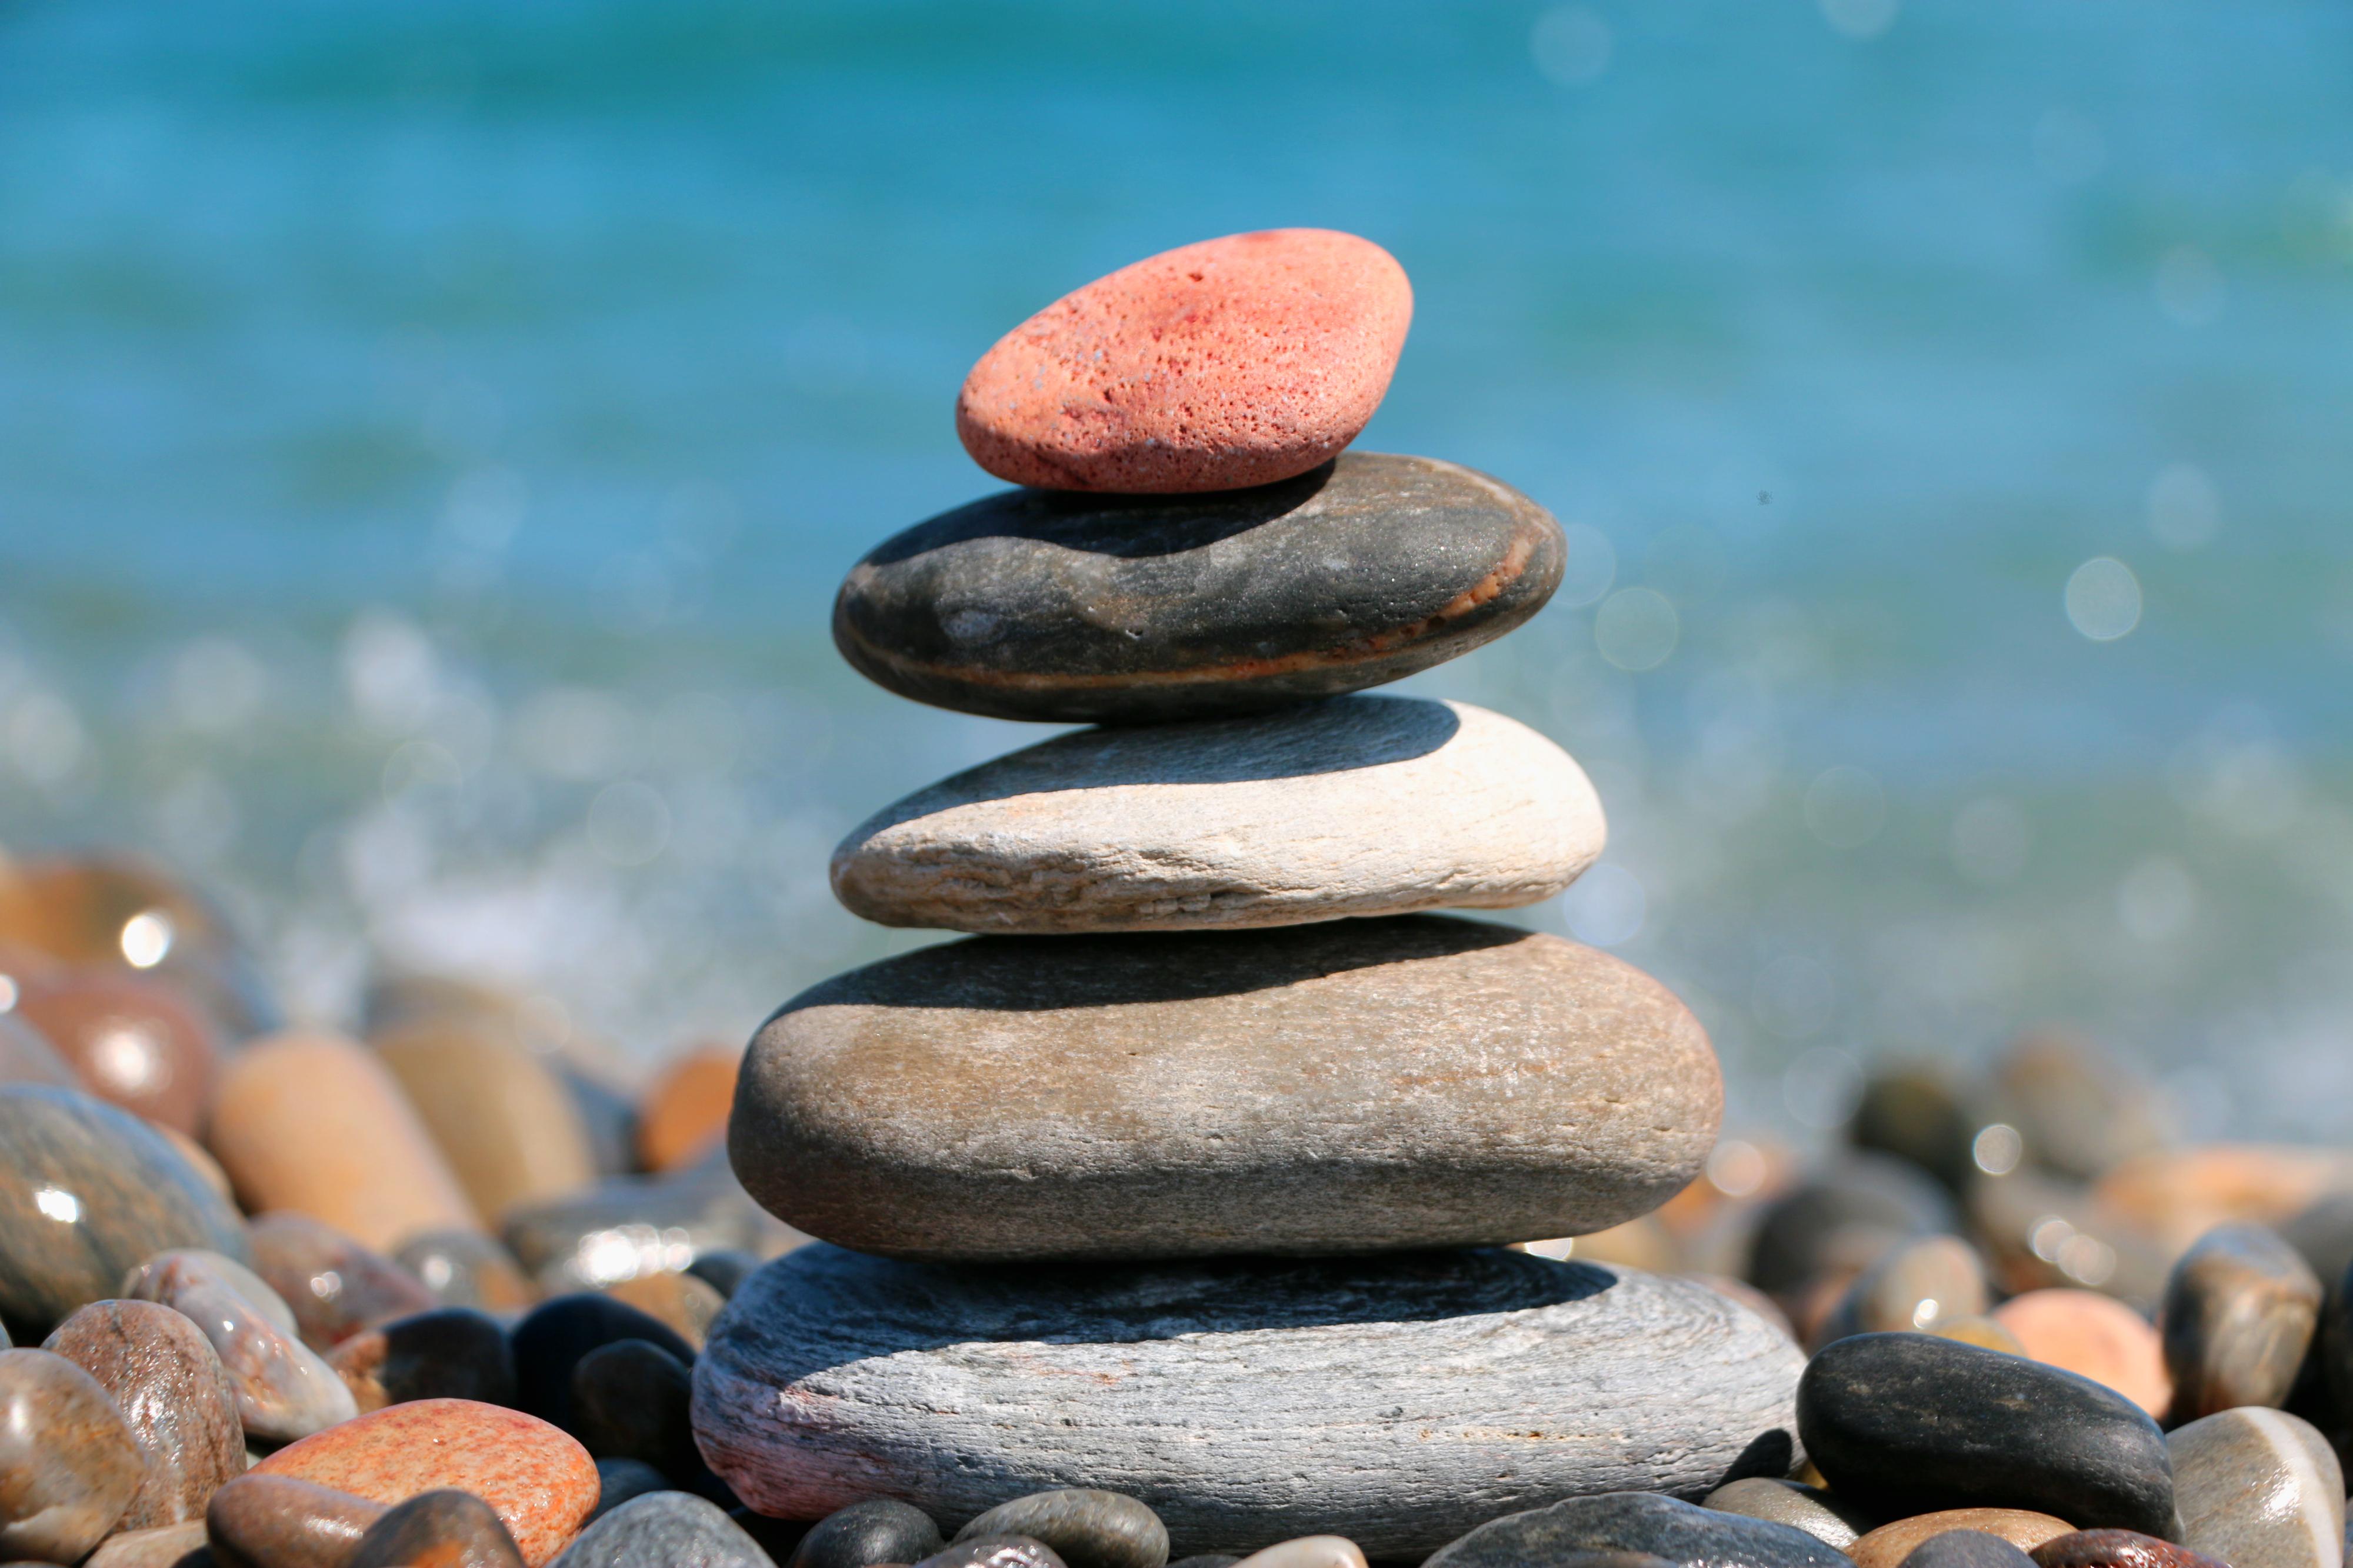 sea-water-rock-stones-beach-stone-Level-seaside-material-step-symbol-ilobsterit-pile-close-up-pebble-797321